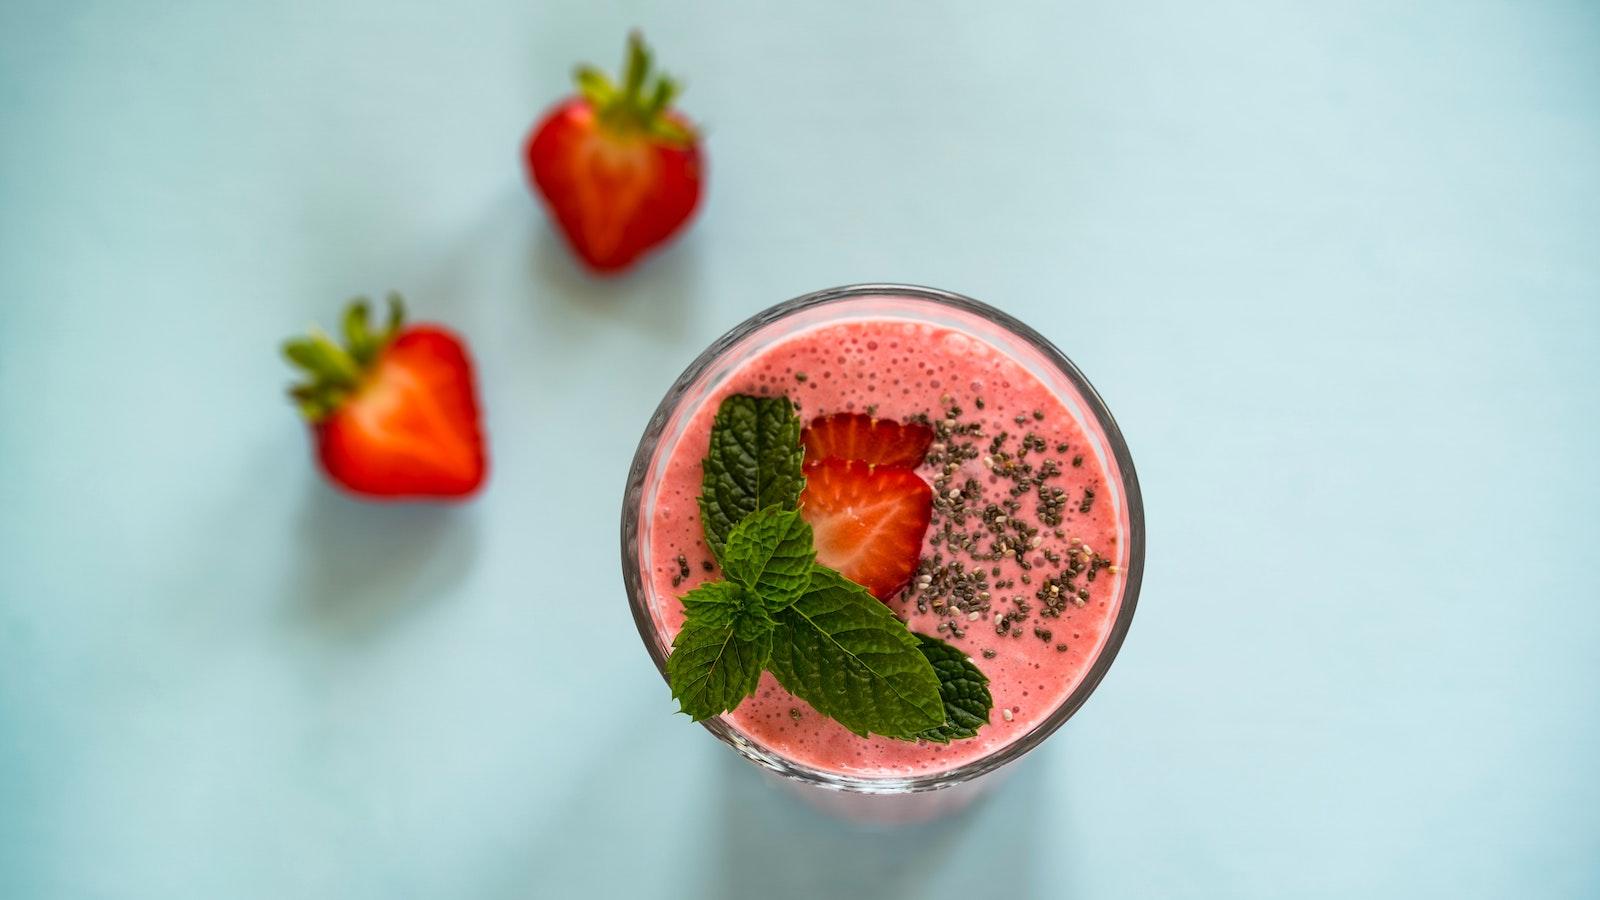 3 recetas de smoothies que te ayudarán a tomar fruta y verdura sin que te enteres